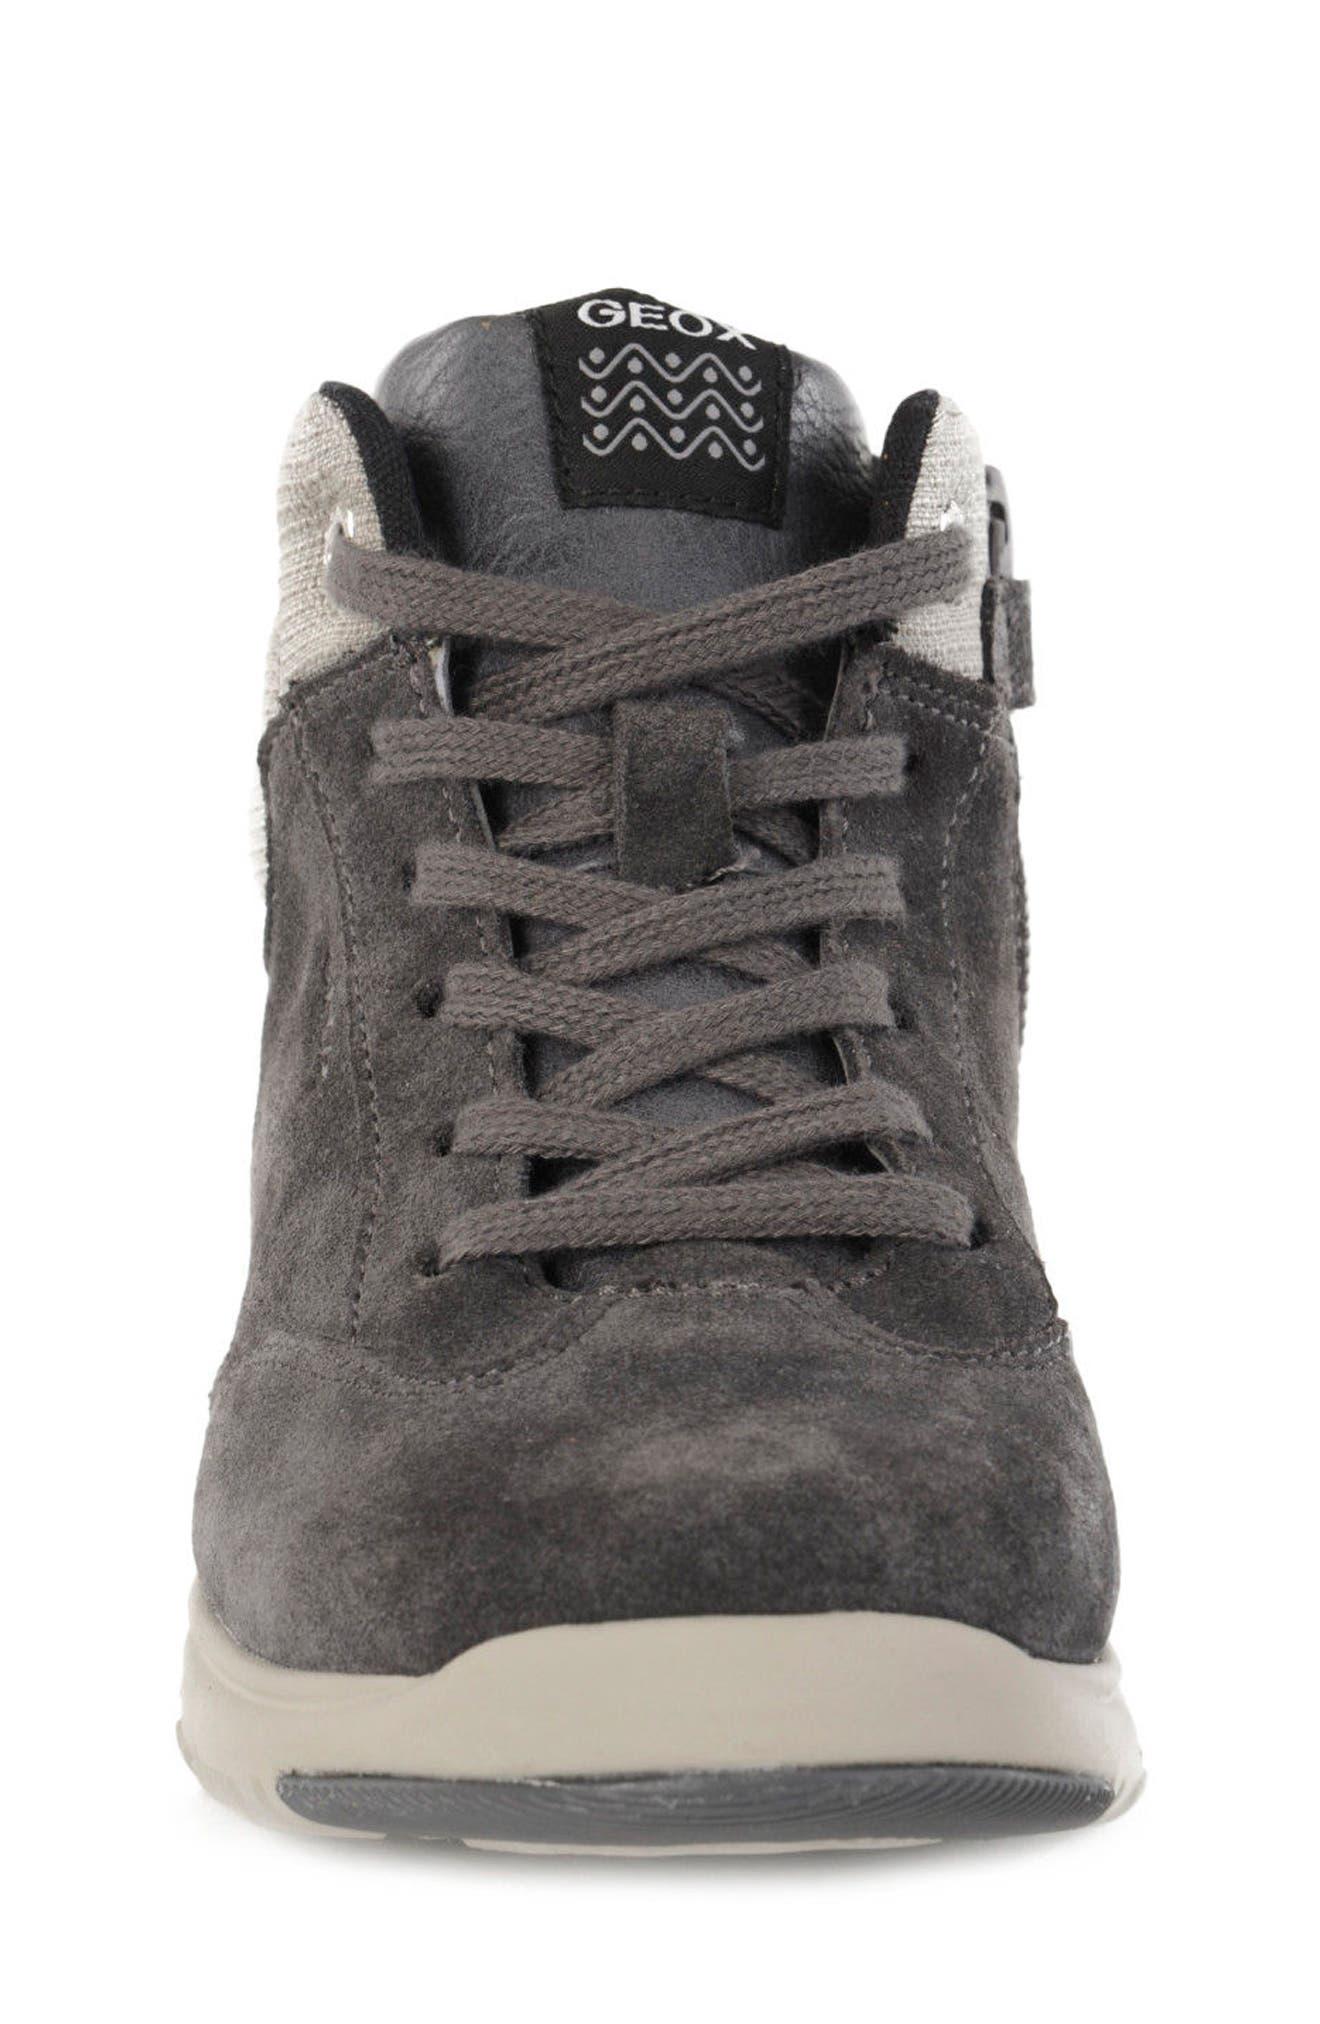 Xunday Mid Top Sneaker,                             Alternate thumbnail 4, color,                             Grey/ Light Grey